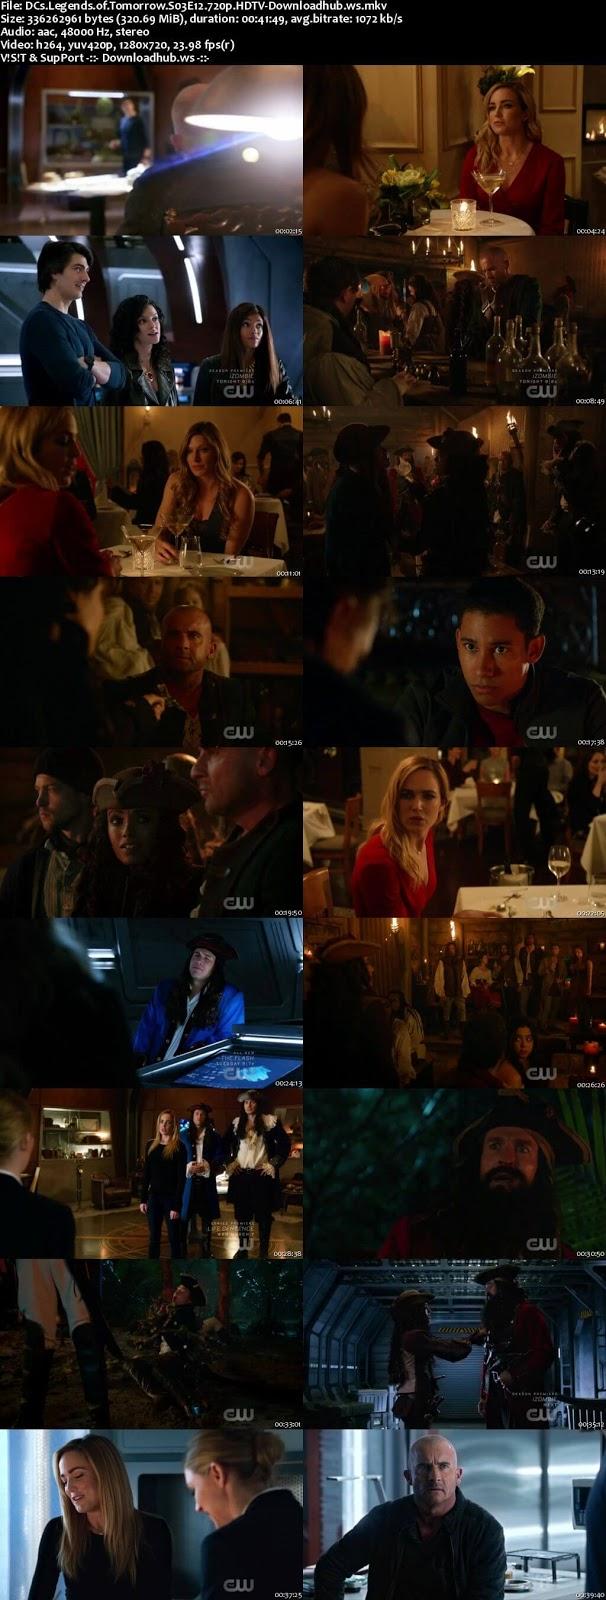 DCs Legends of Tomorrow S03E12 320MB HDTV 720p x264